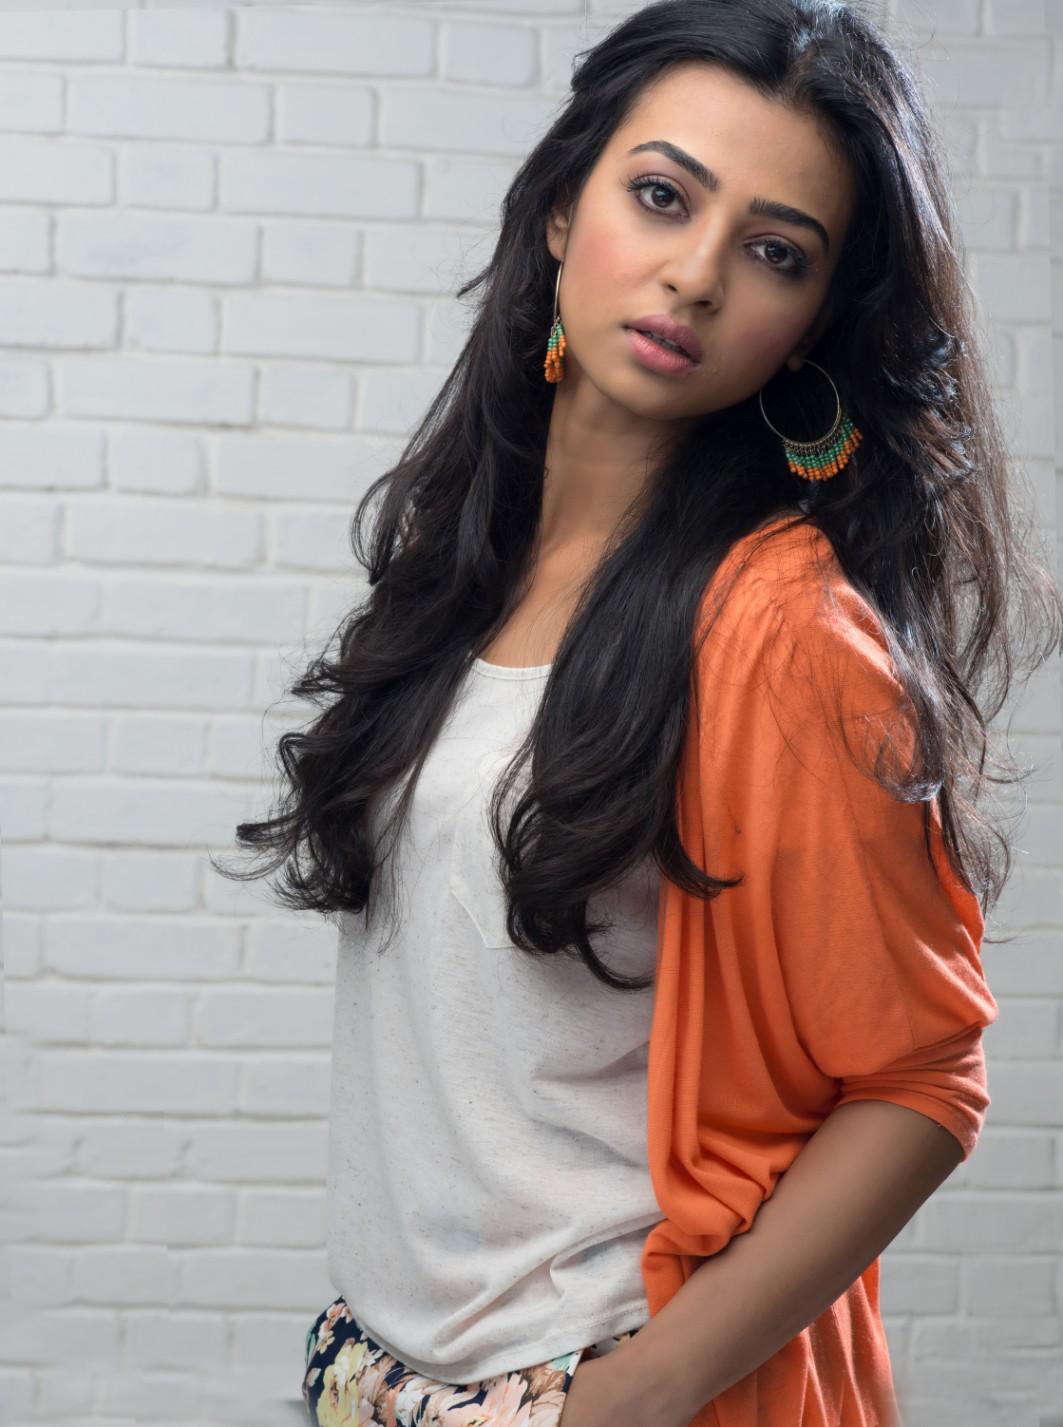 radhika-apte-sexy